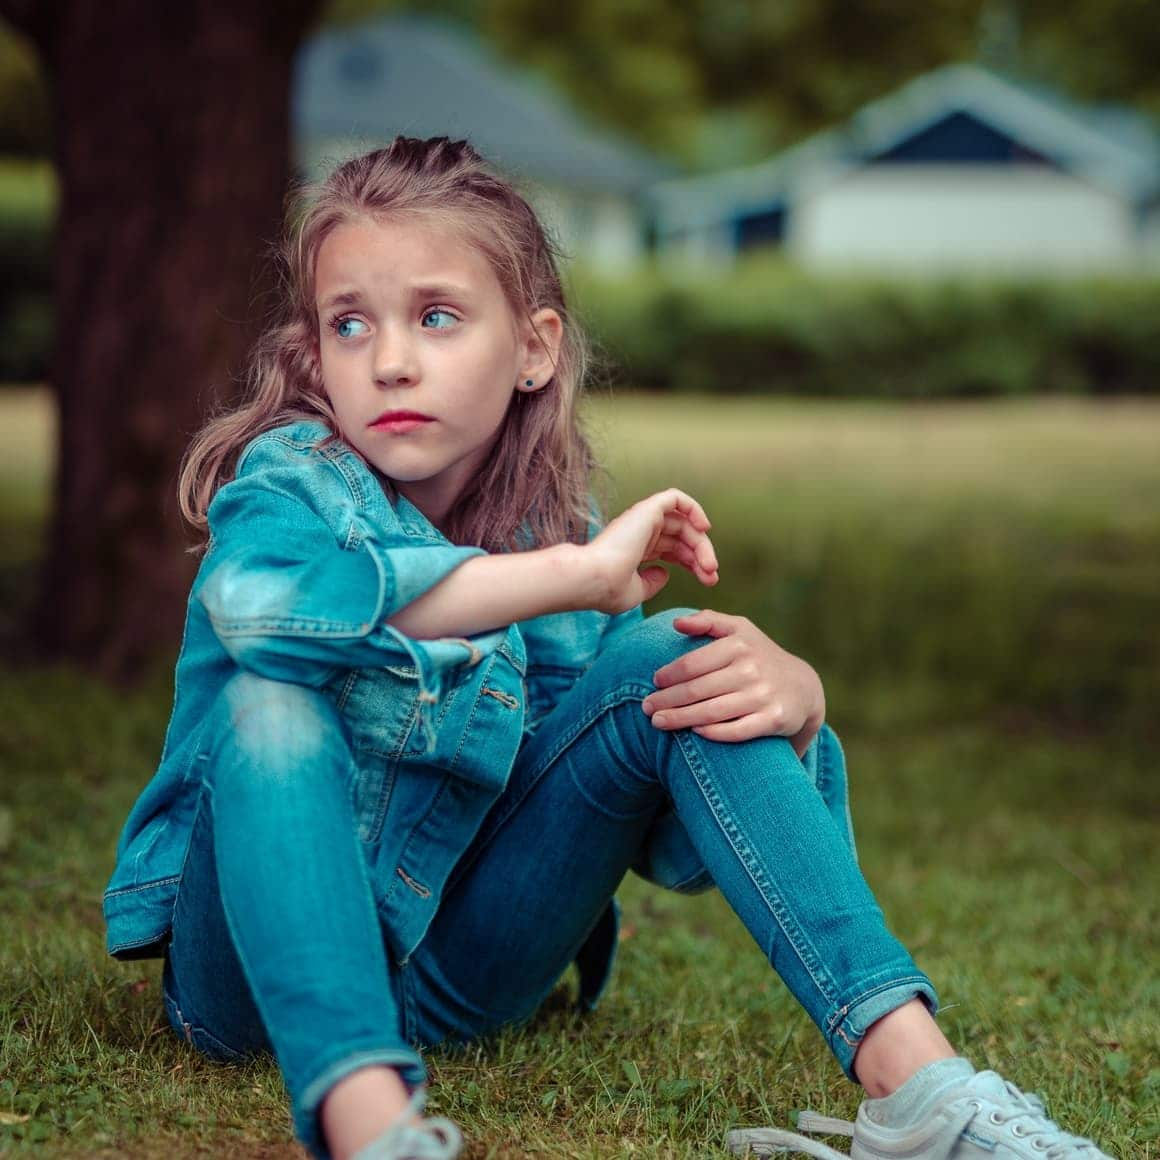 Girl sitting looking sad. Homeschooling Vs public school